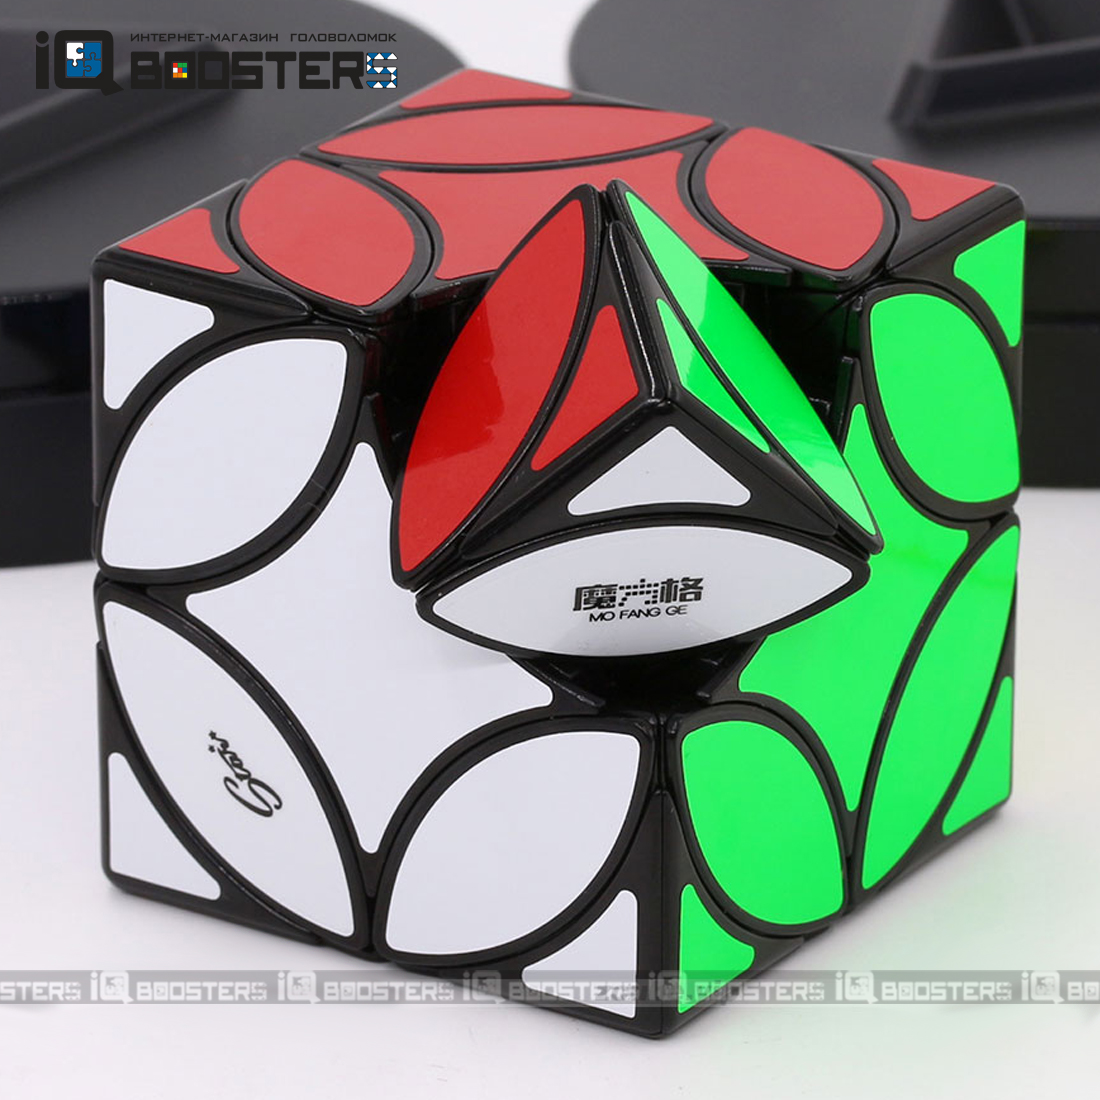 qiyi_coin_cube_3